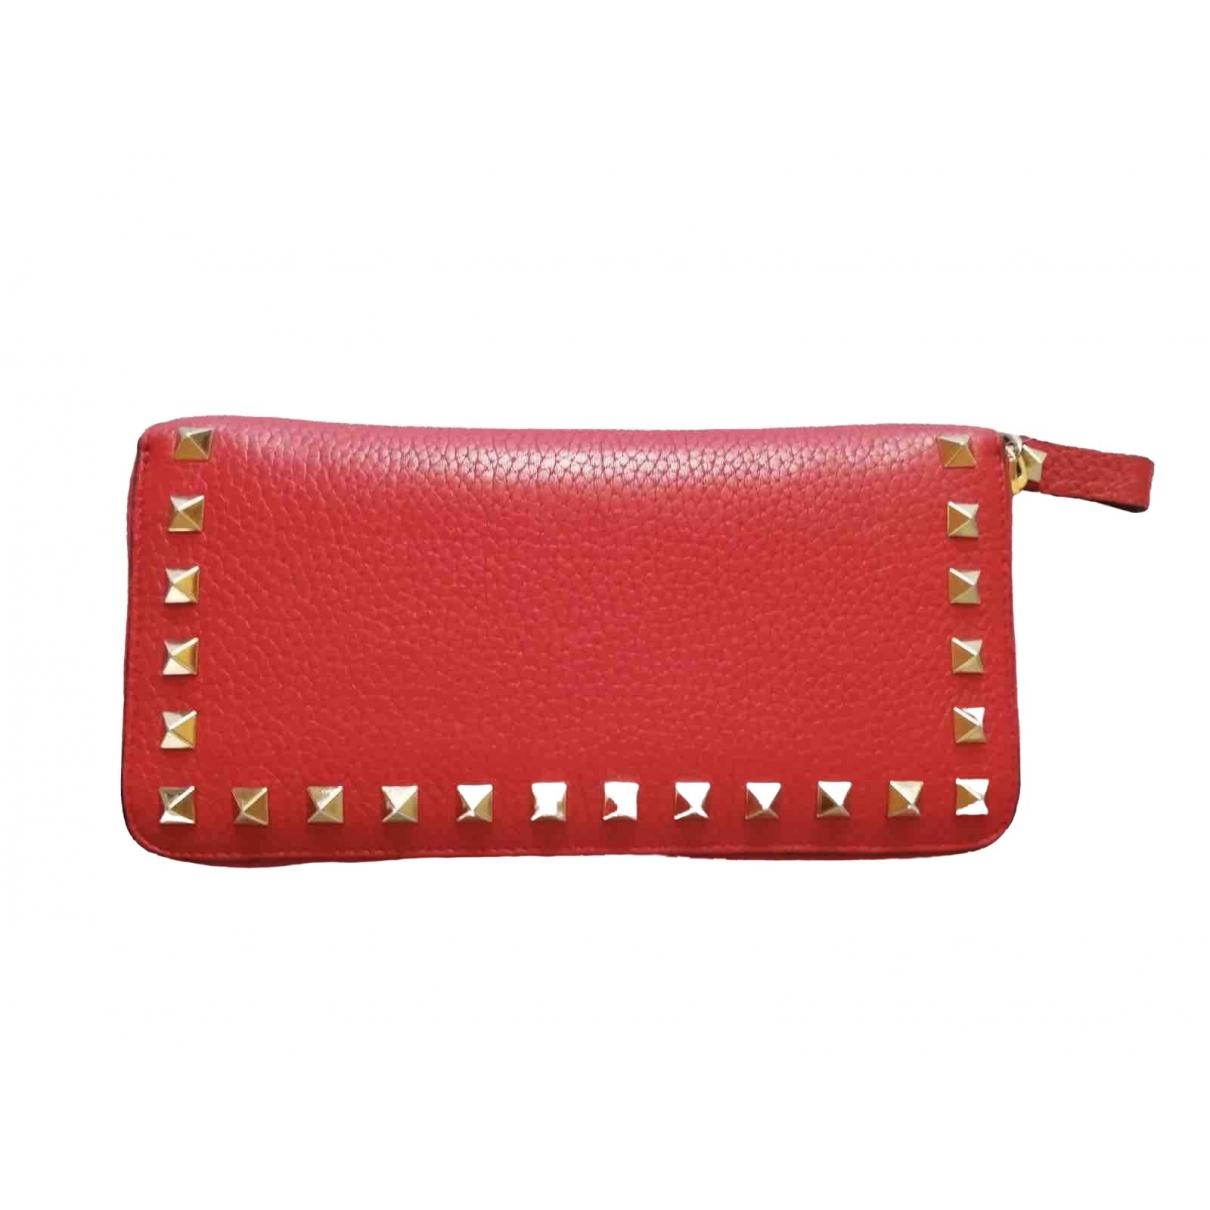 Valentino Garavani \N Red Leather wallet for Women \N